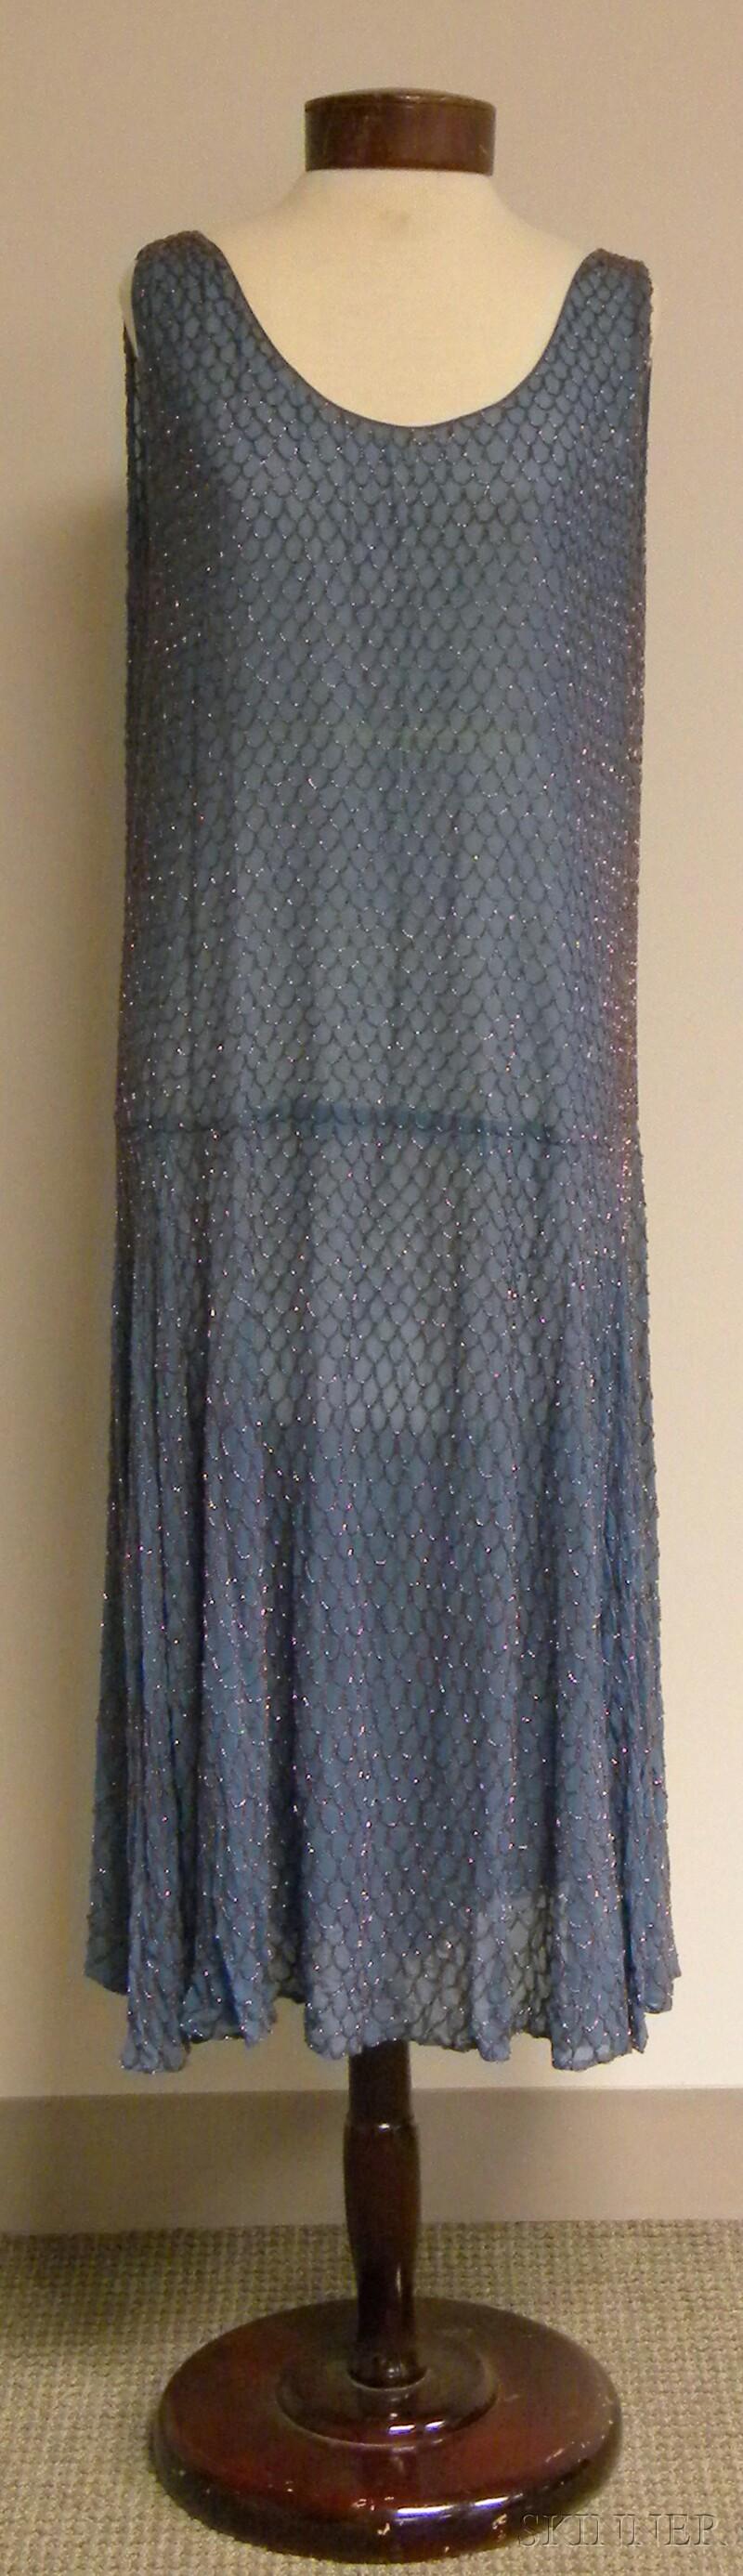 1920s Sky Blue Fish Scale-patterned Beaded Silk Dress